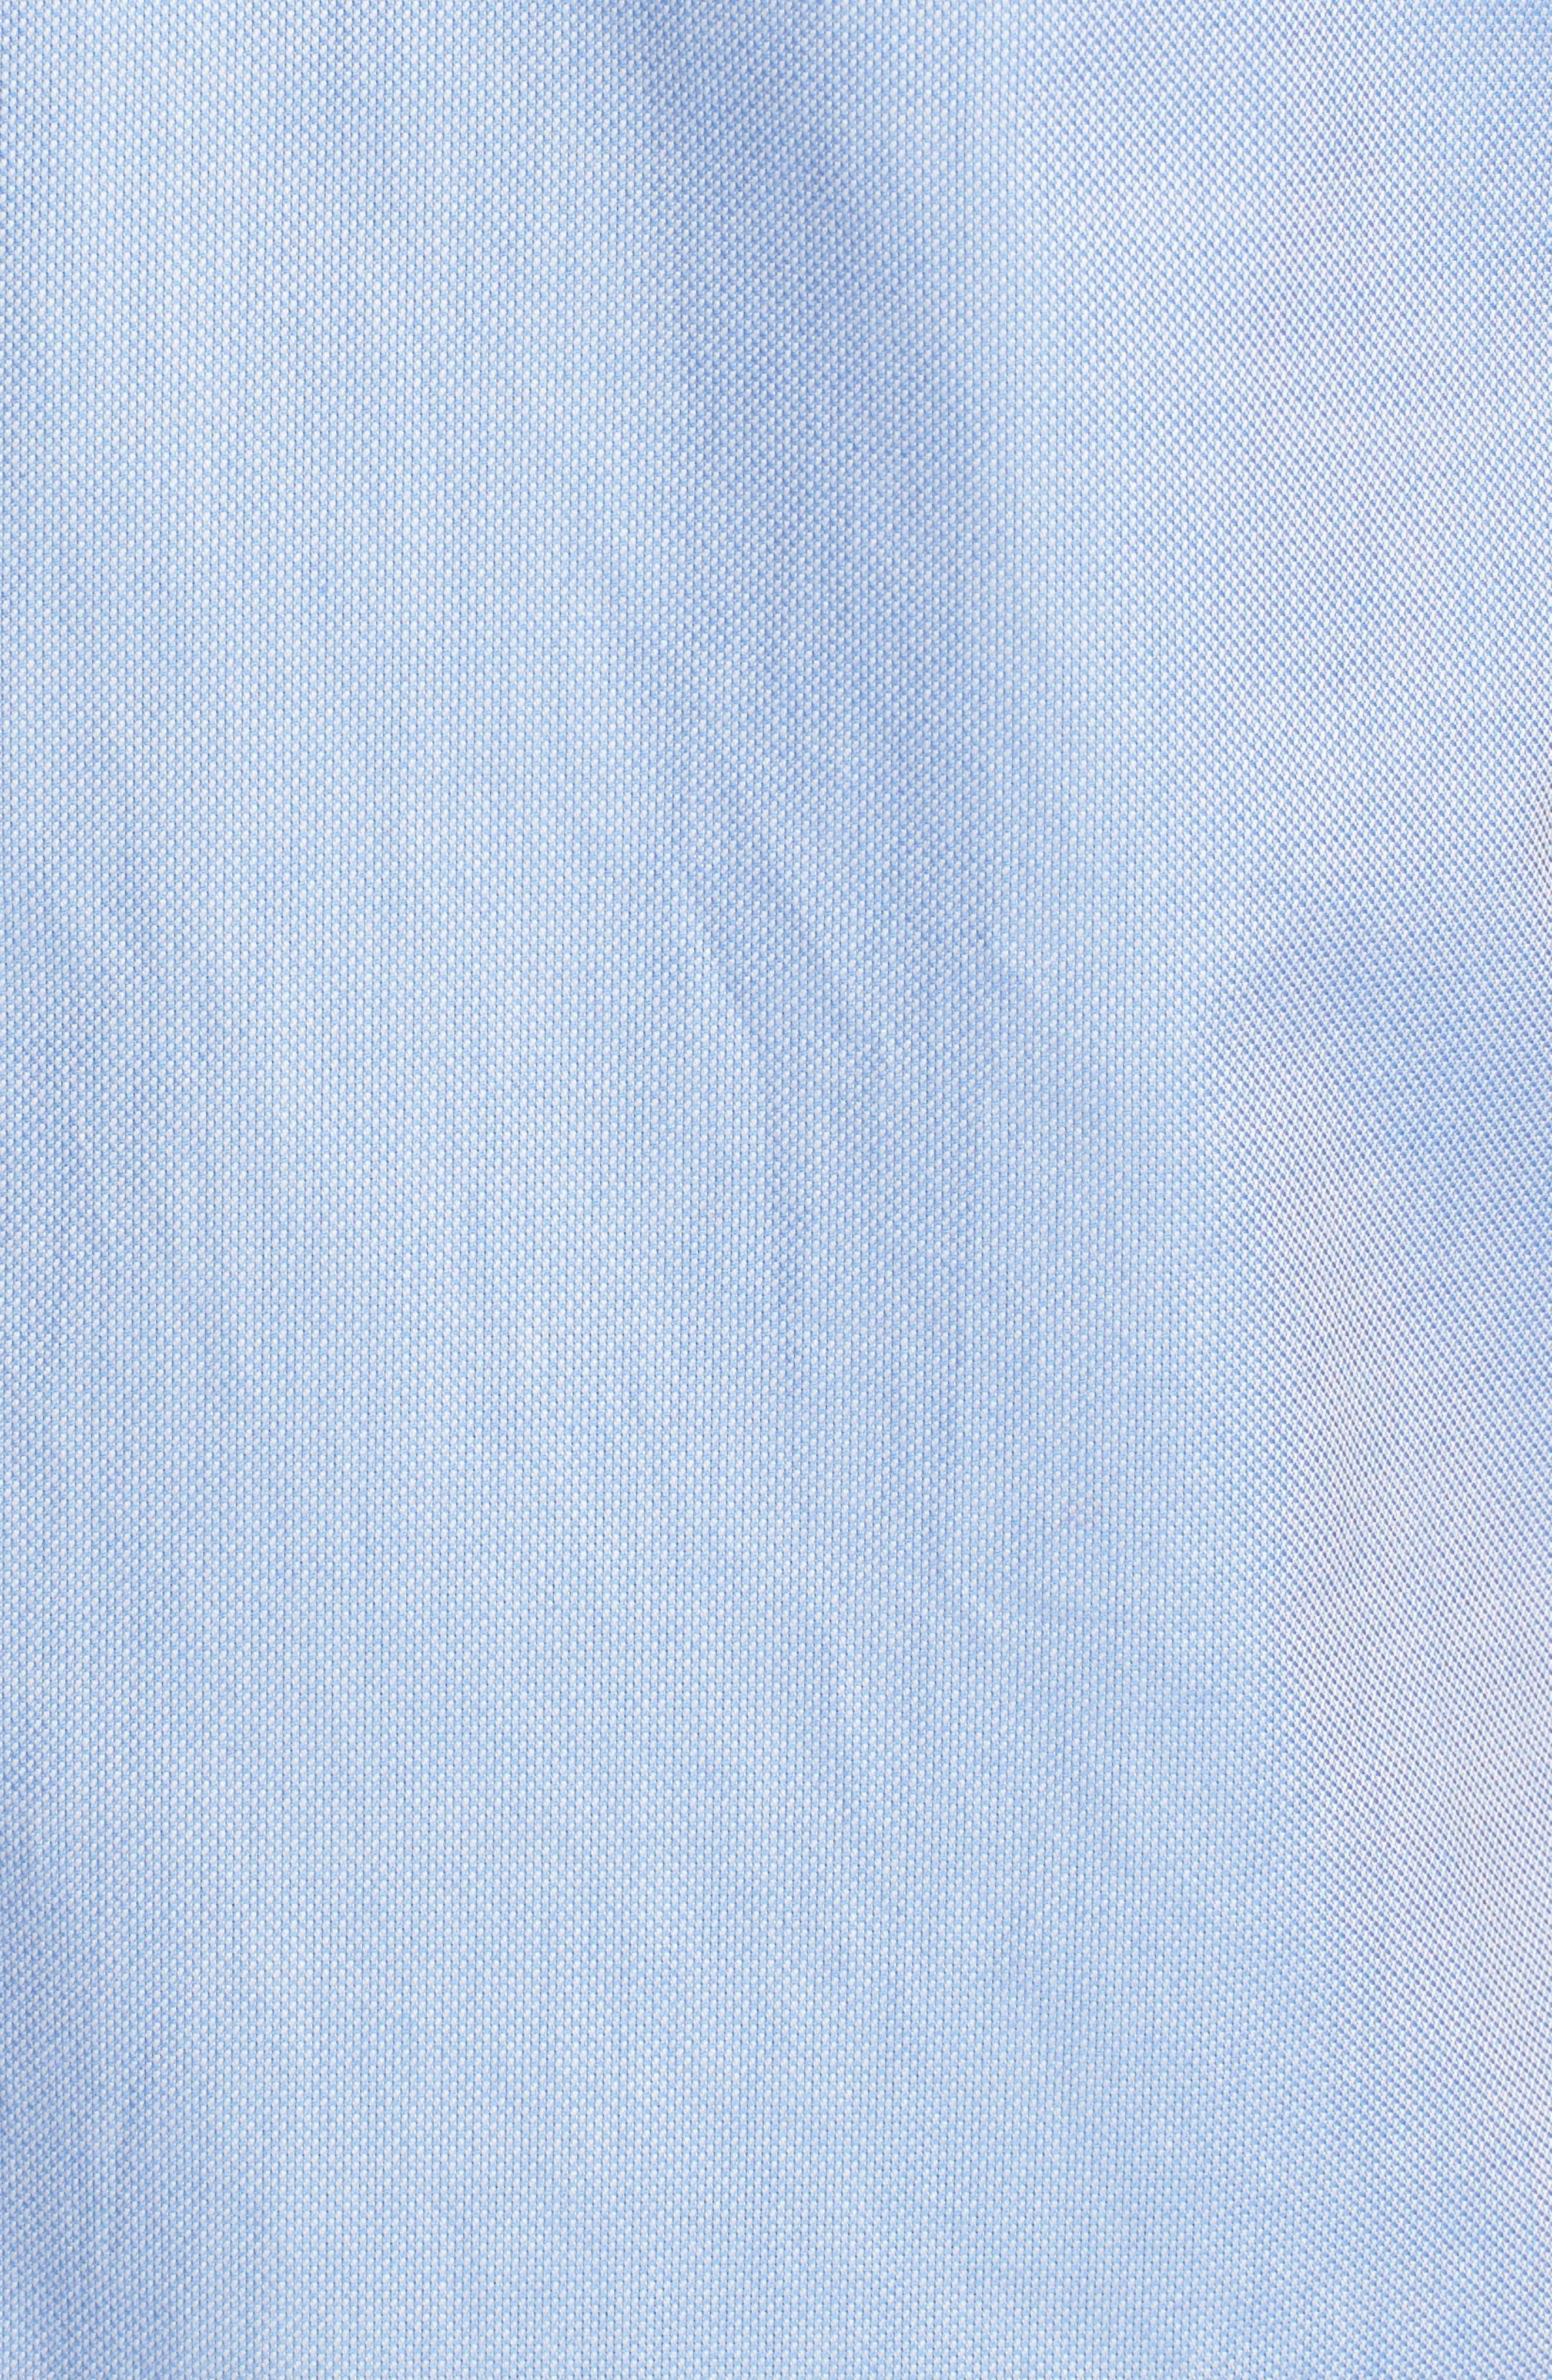 Wallott Extra Slim Fit Short Sleeve Sport Shirt,                             Alternate thumbnail 5, color,                             Blue